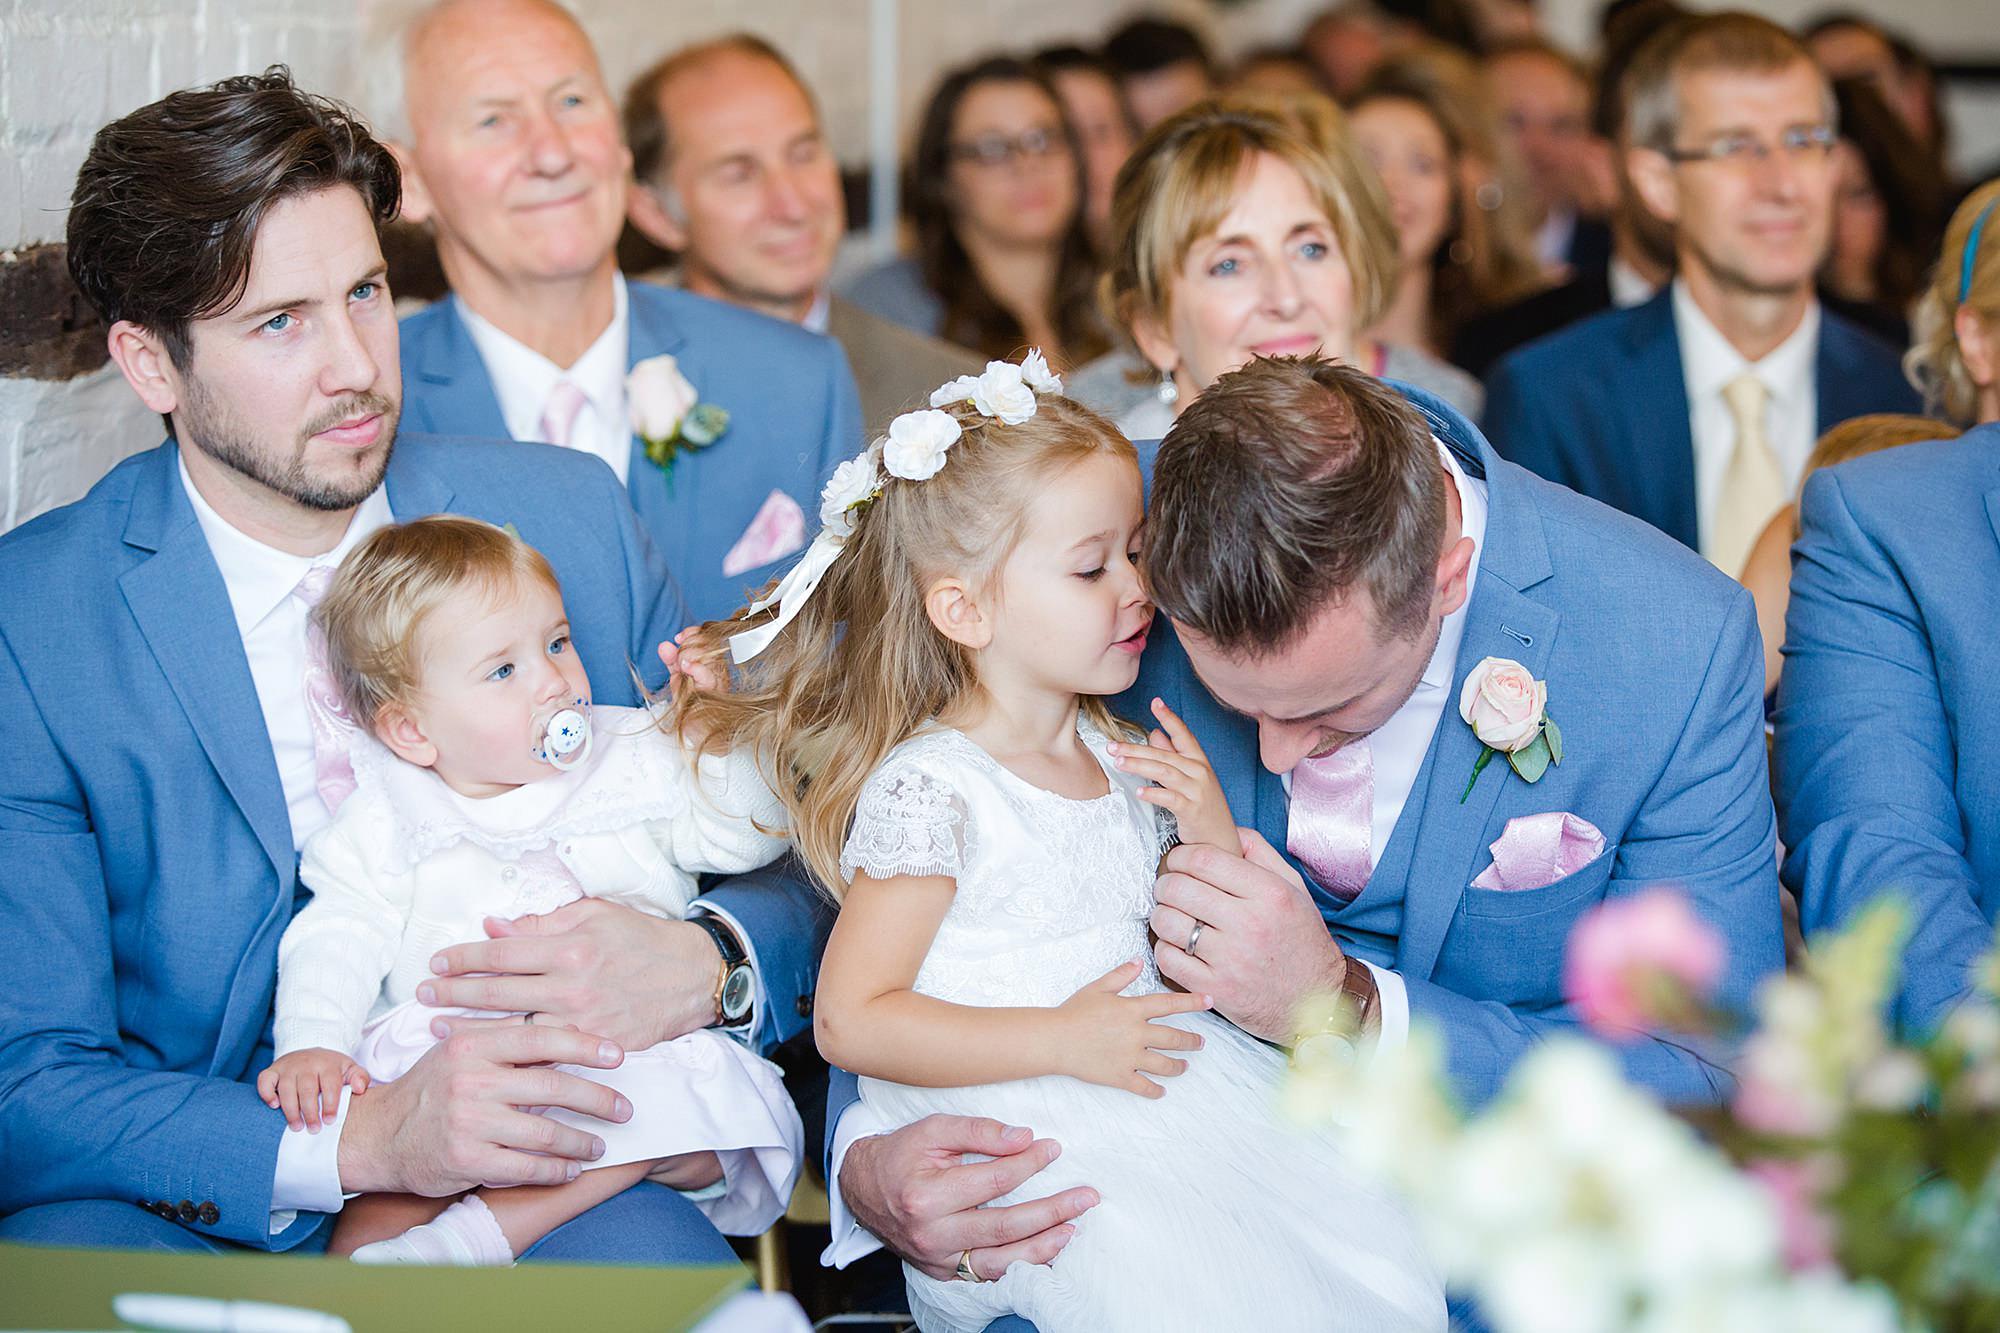 Lillibrooke Manor wedding flower girl whispering to groomsman